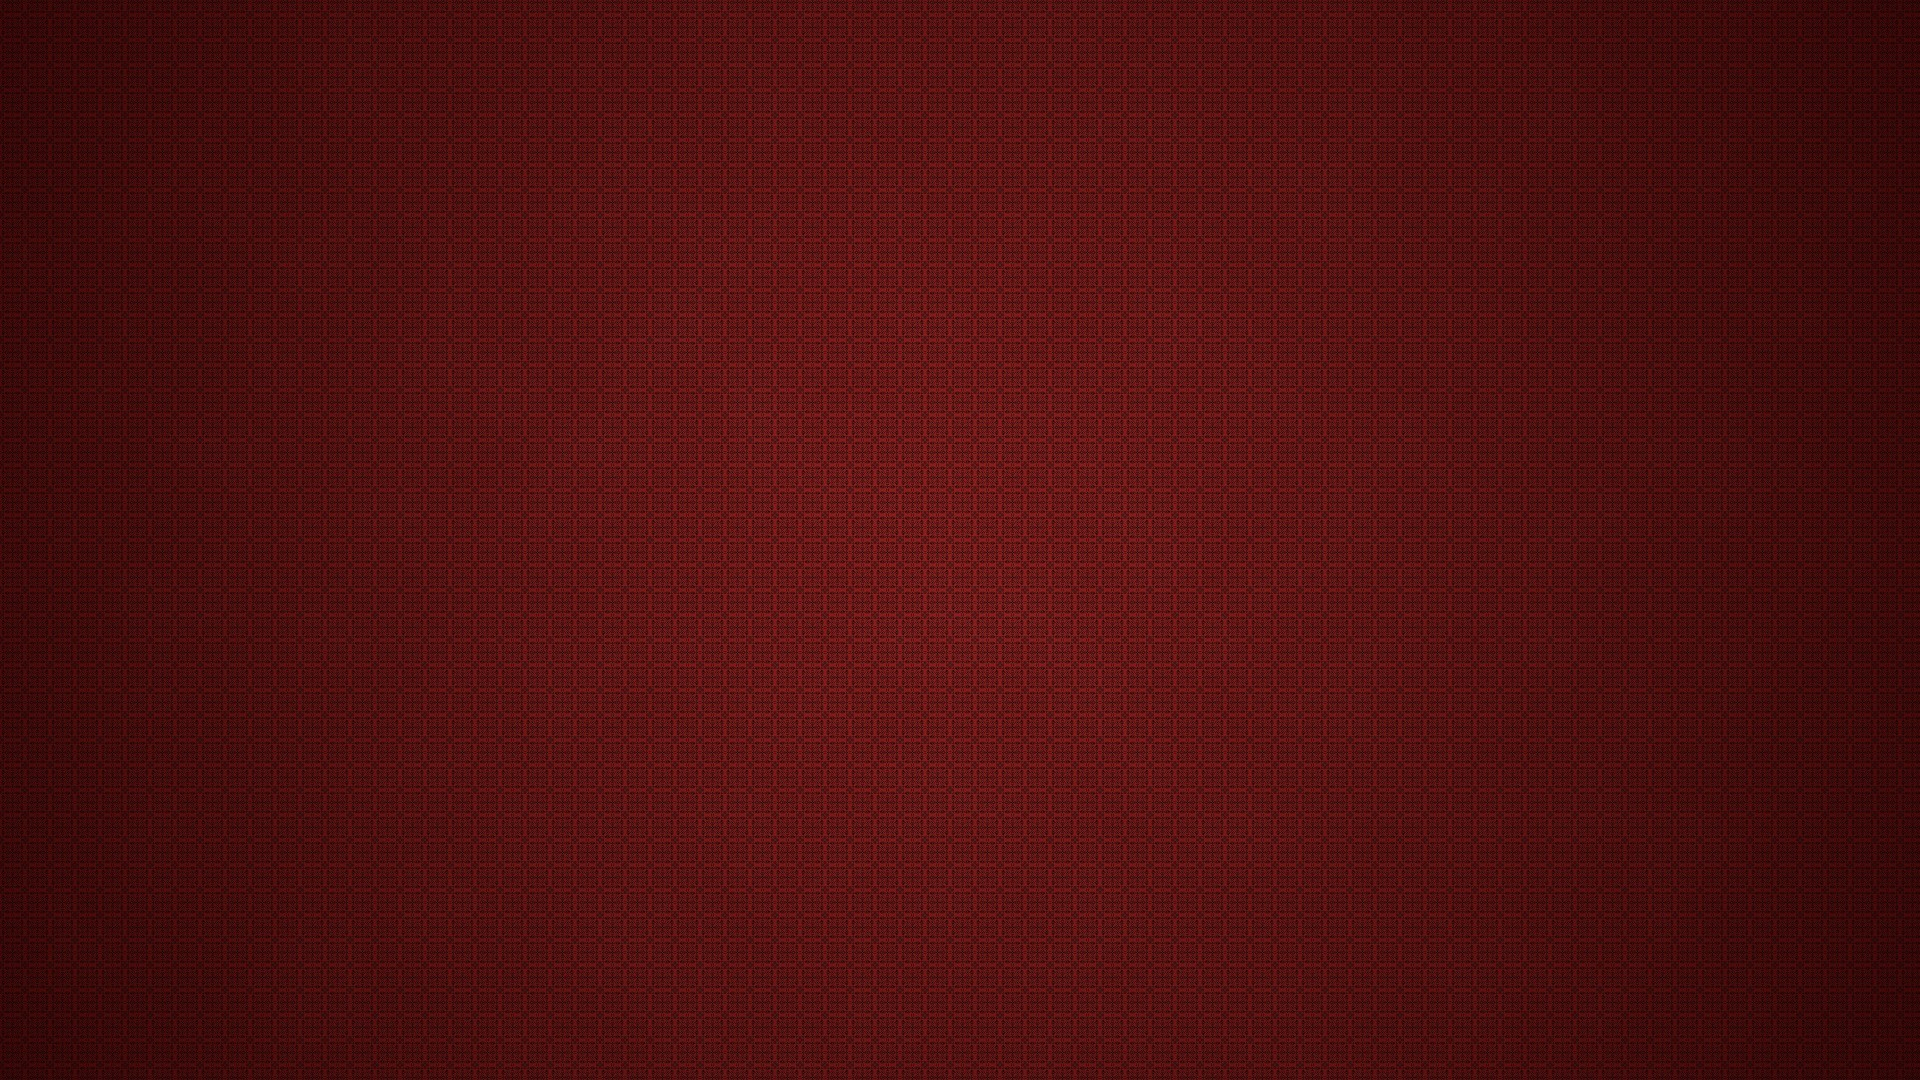 цвет бордо  № 1853796 без смс